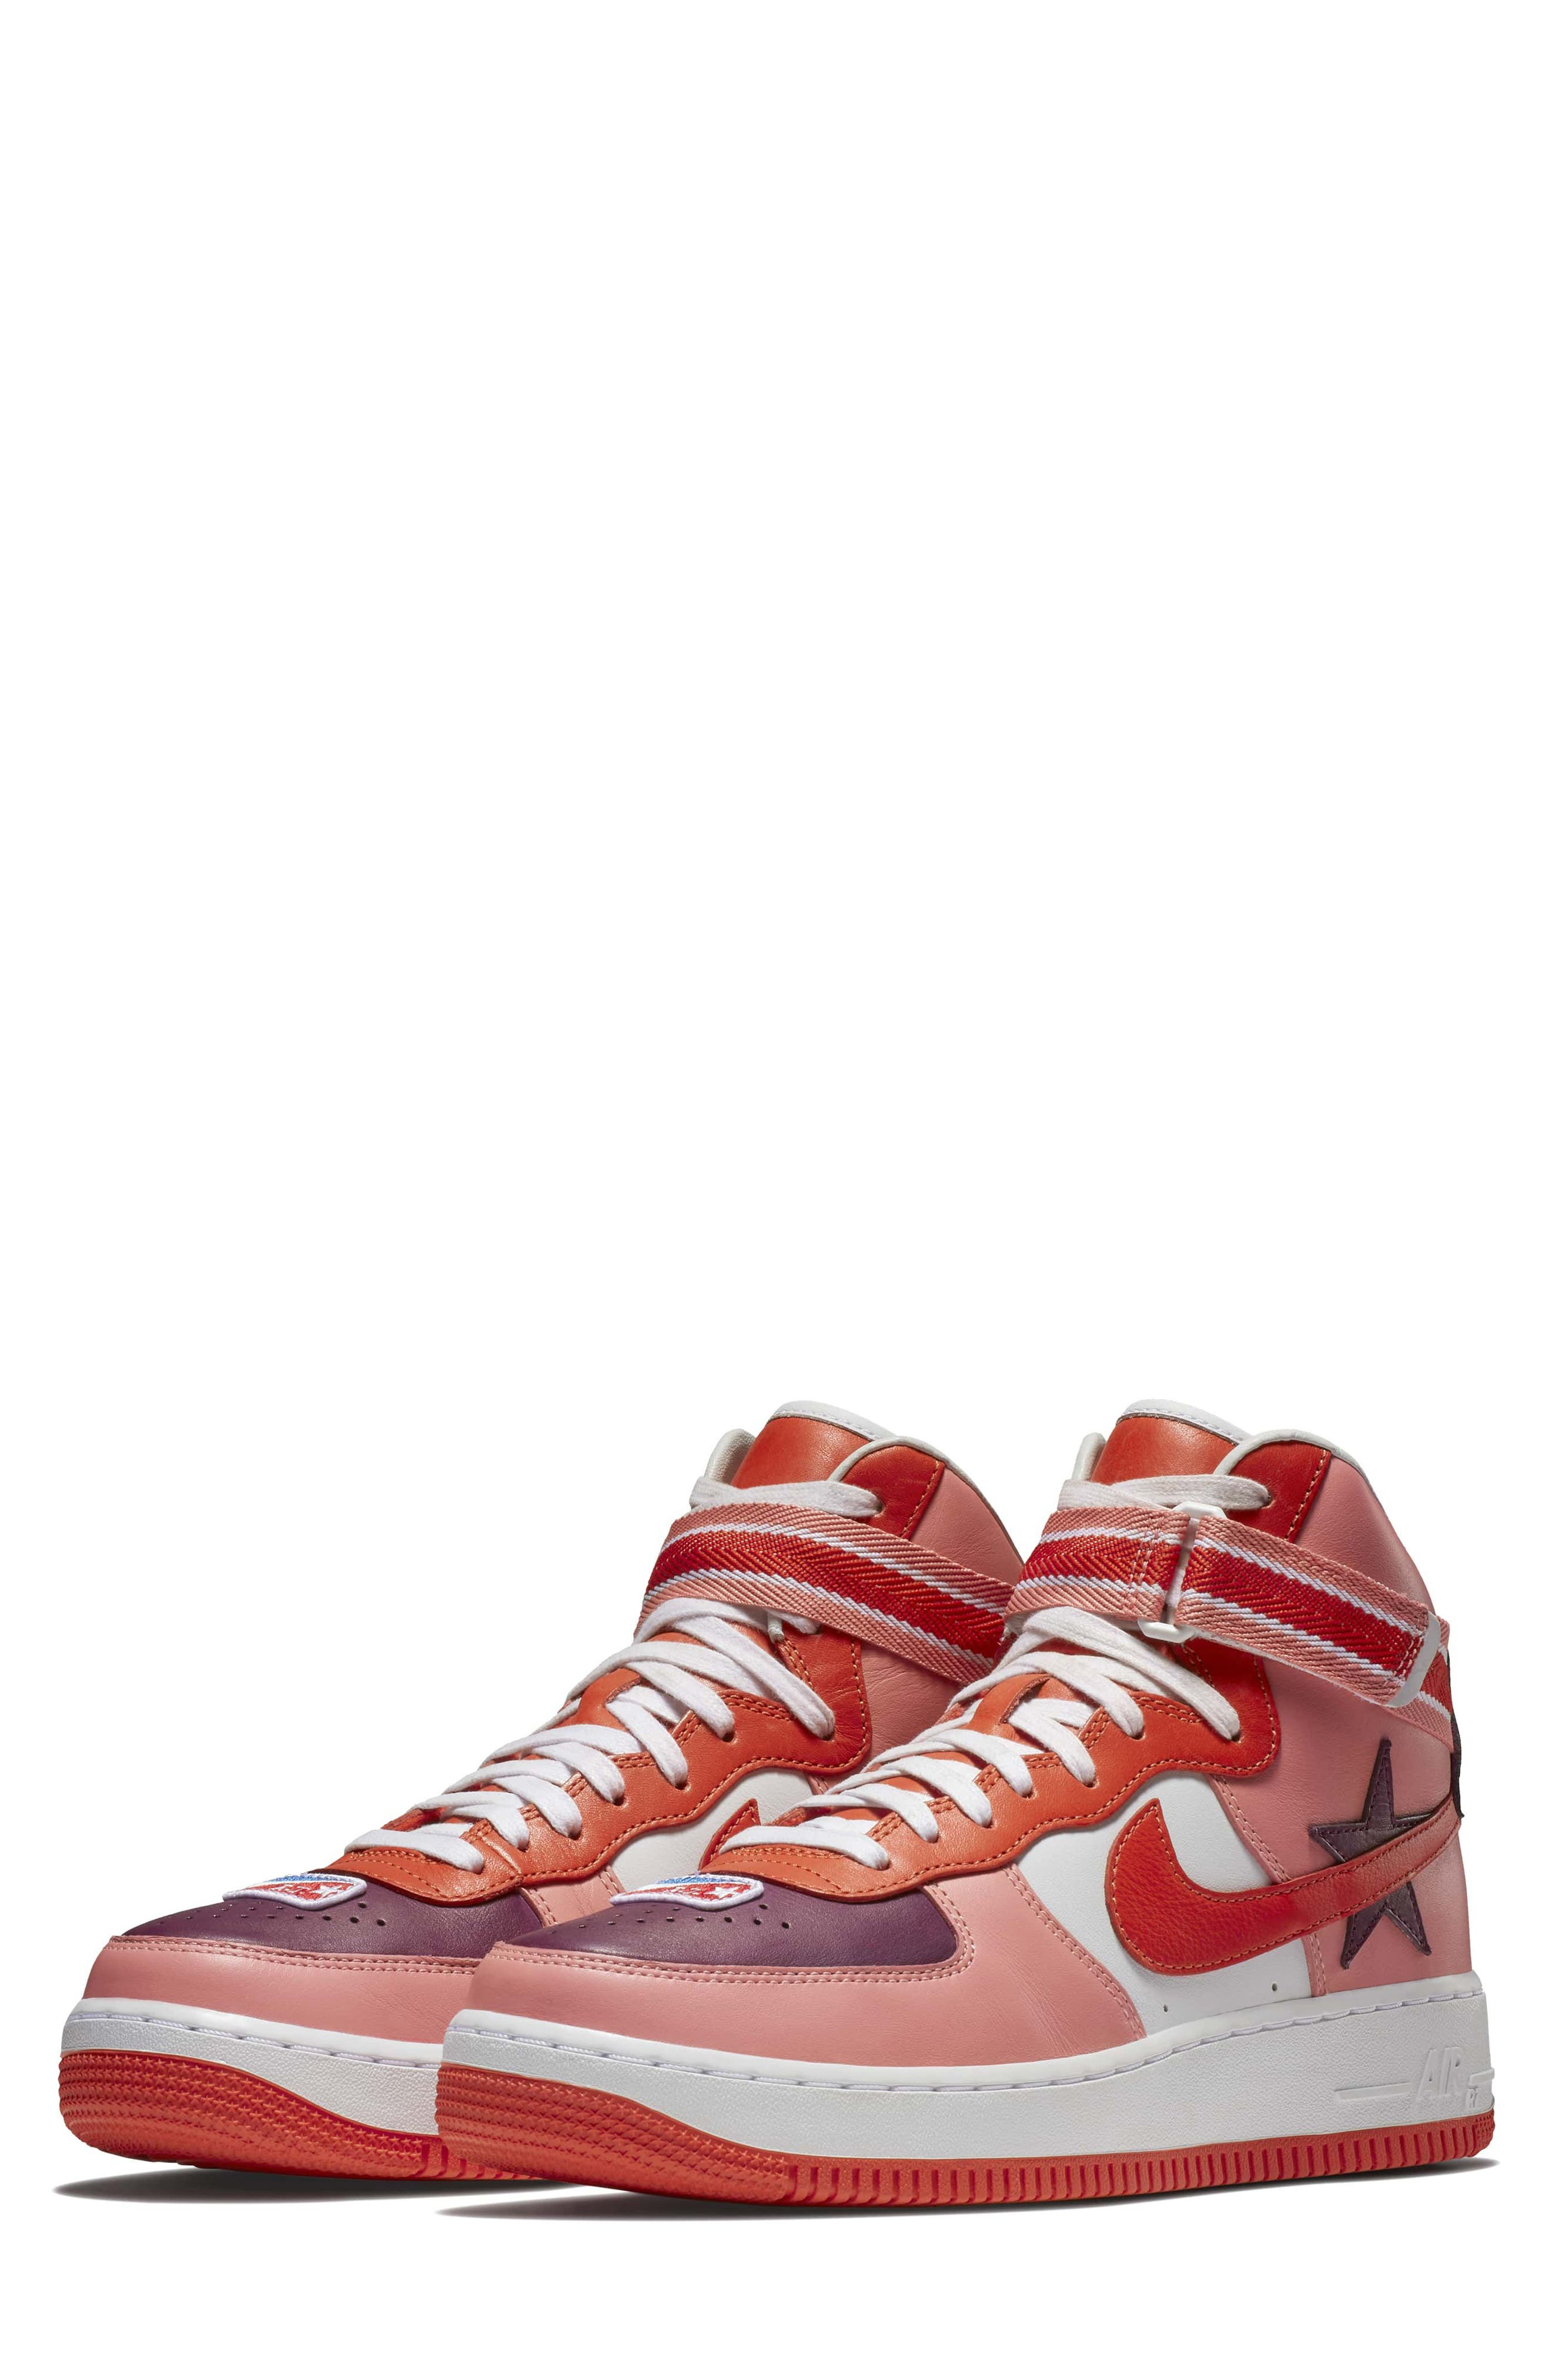 Air Force 1 High RT Sneaker,                             Main thumbnail 1, color,                             Coral/ Bordeax/ Orange/ Black